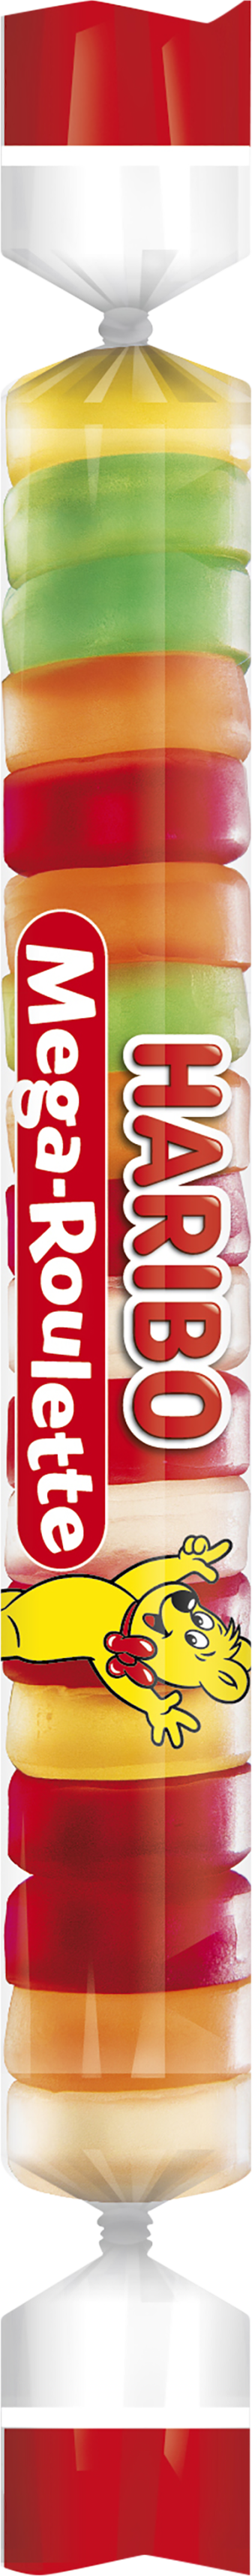 products-packshot-Mega Roulette(NB,4:3)